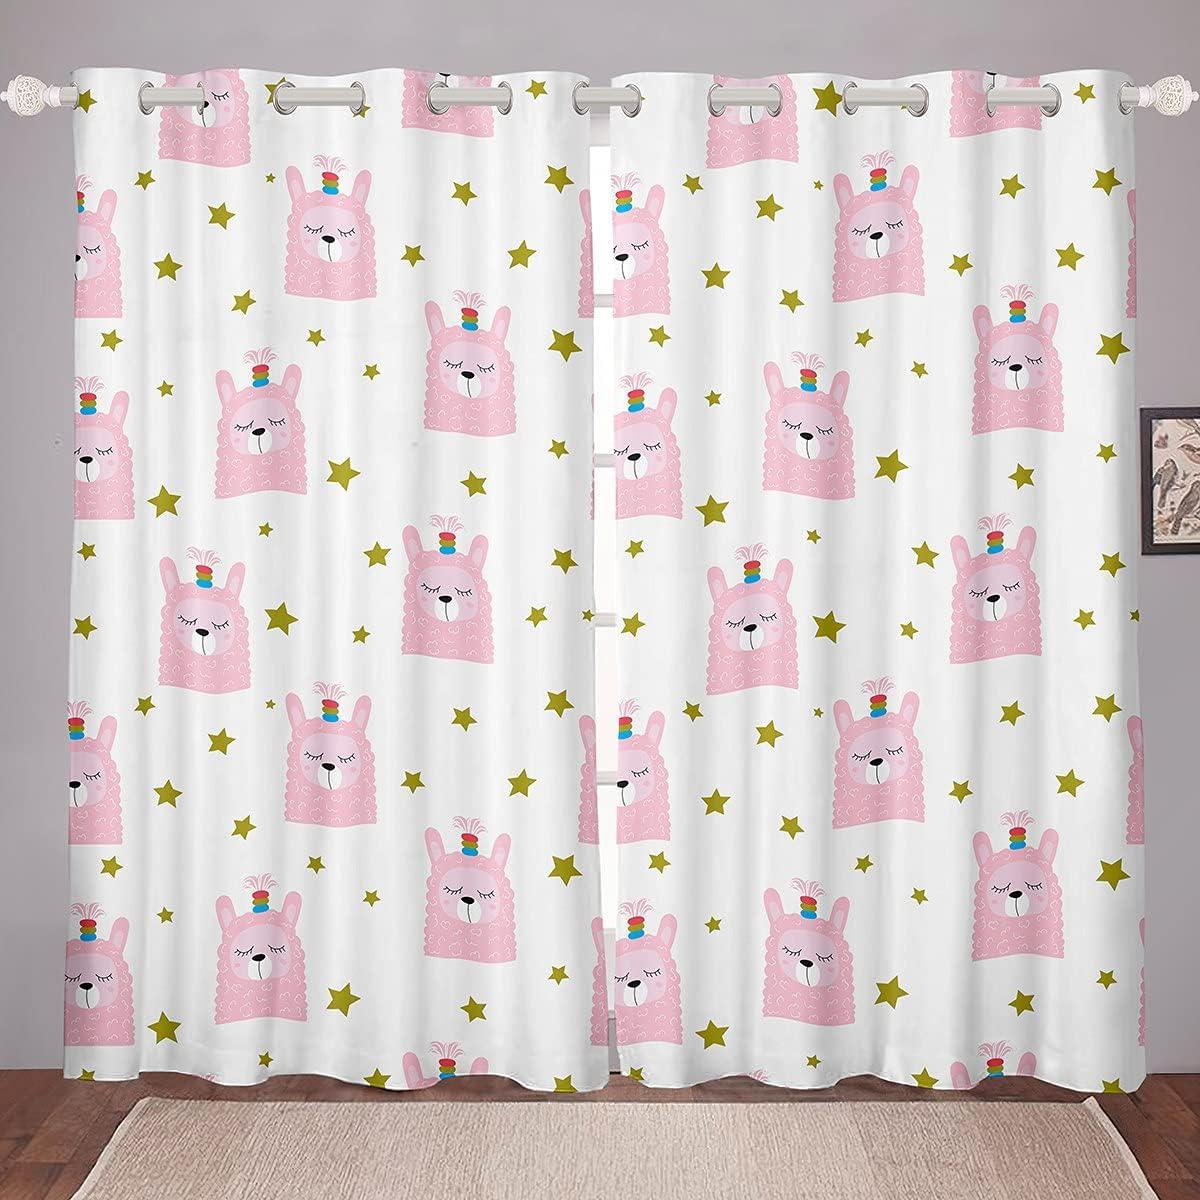 Cute Llama Window New popularity Curtains for Living Pink mart Cartoon Bedroom Room